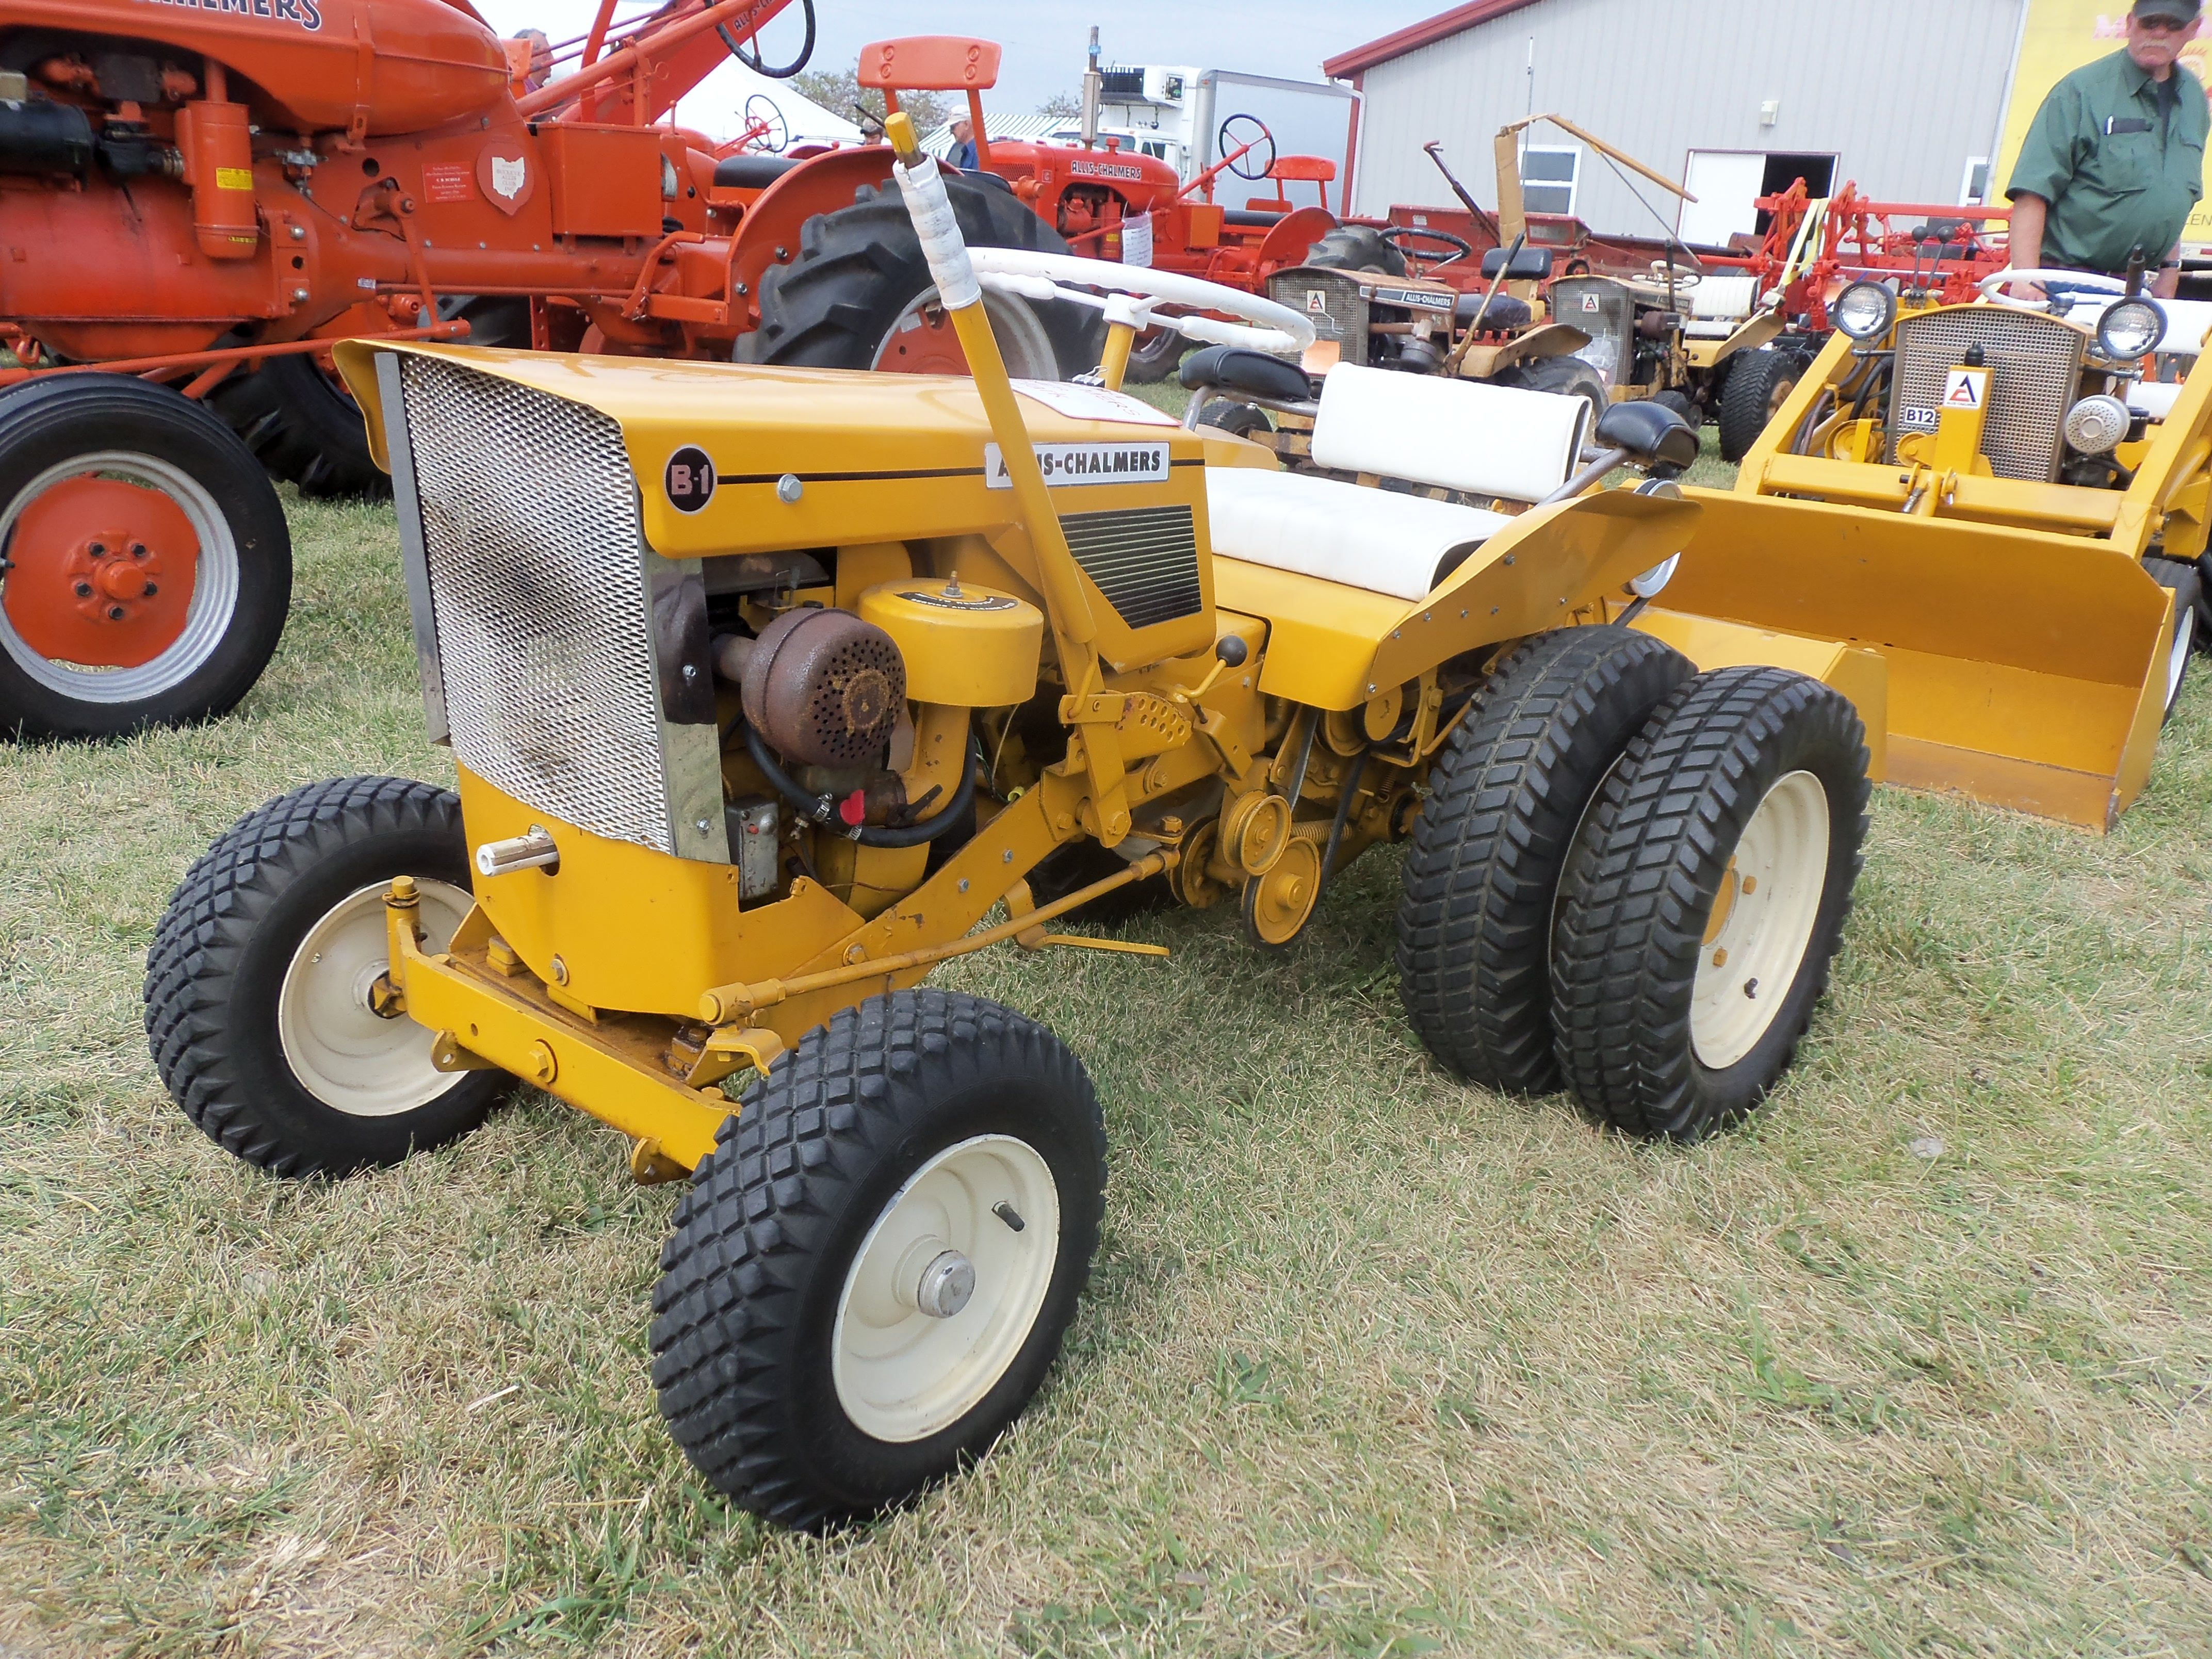 Marvelous Allis Chalmers B1 Lawn U0026 Garden Tractor